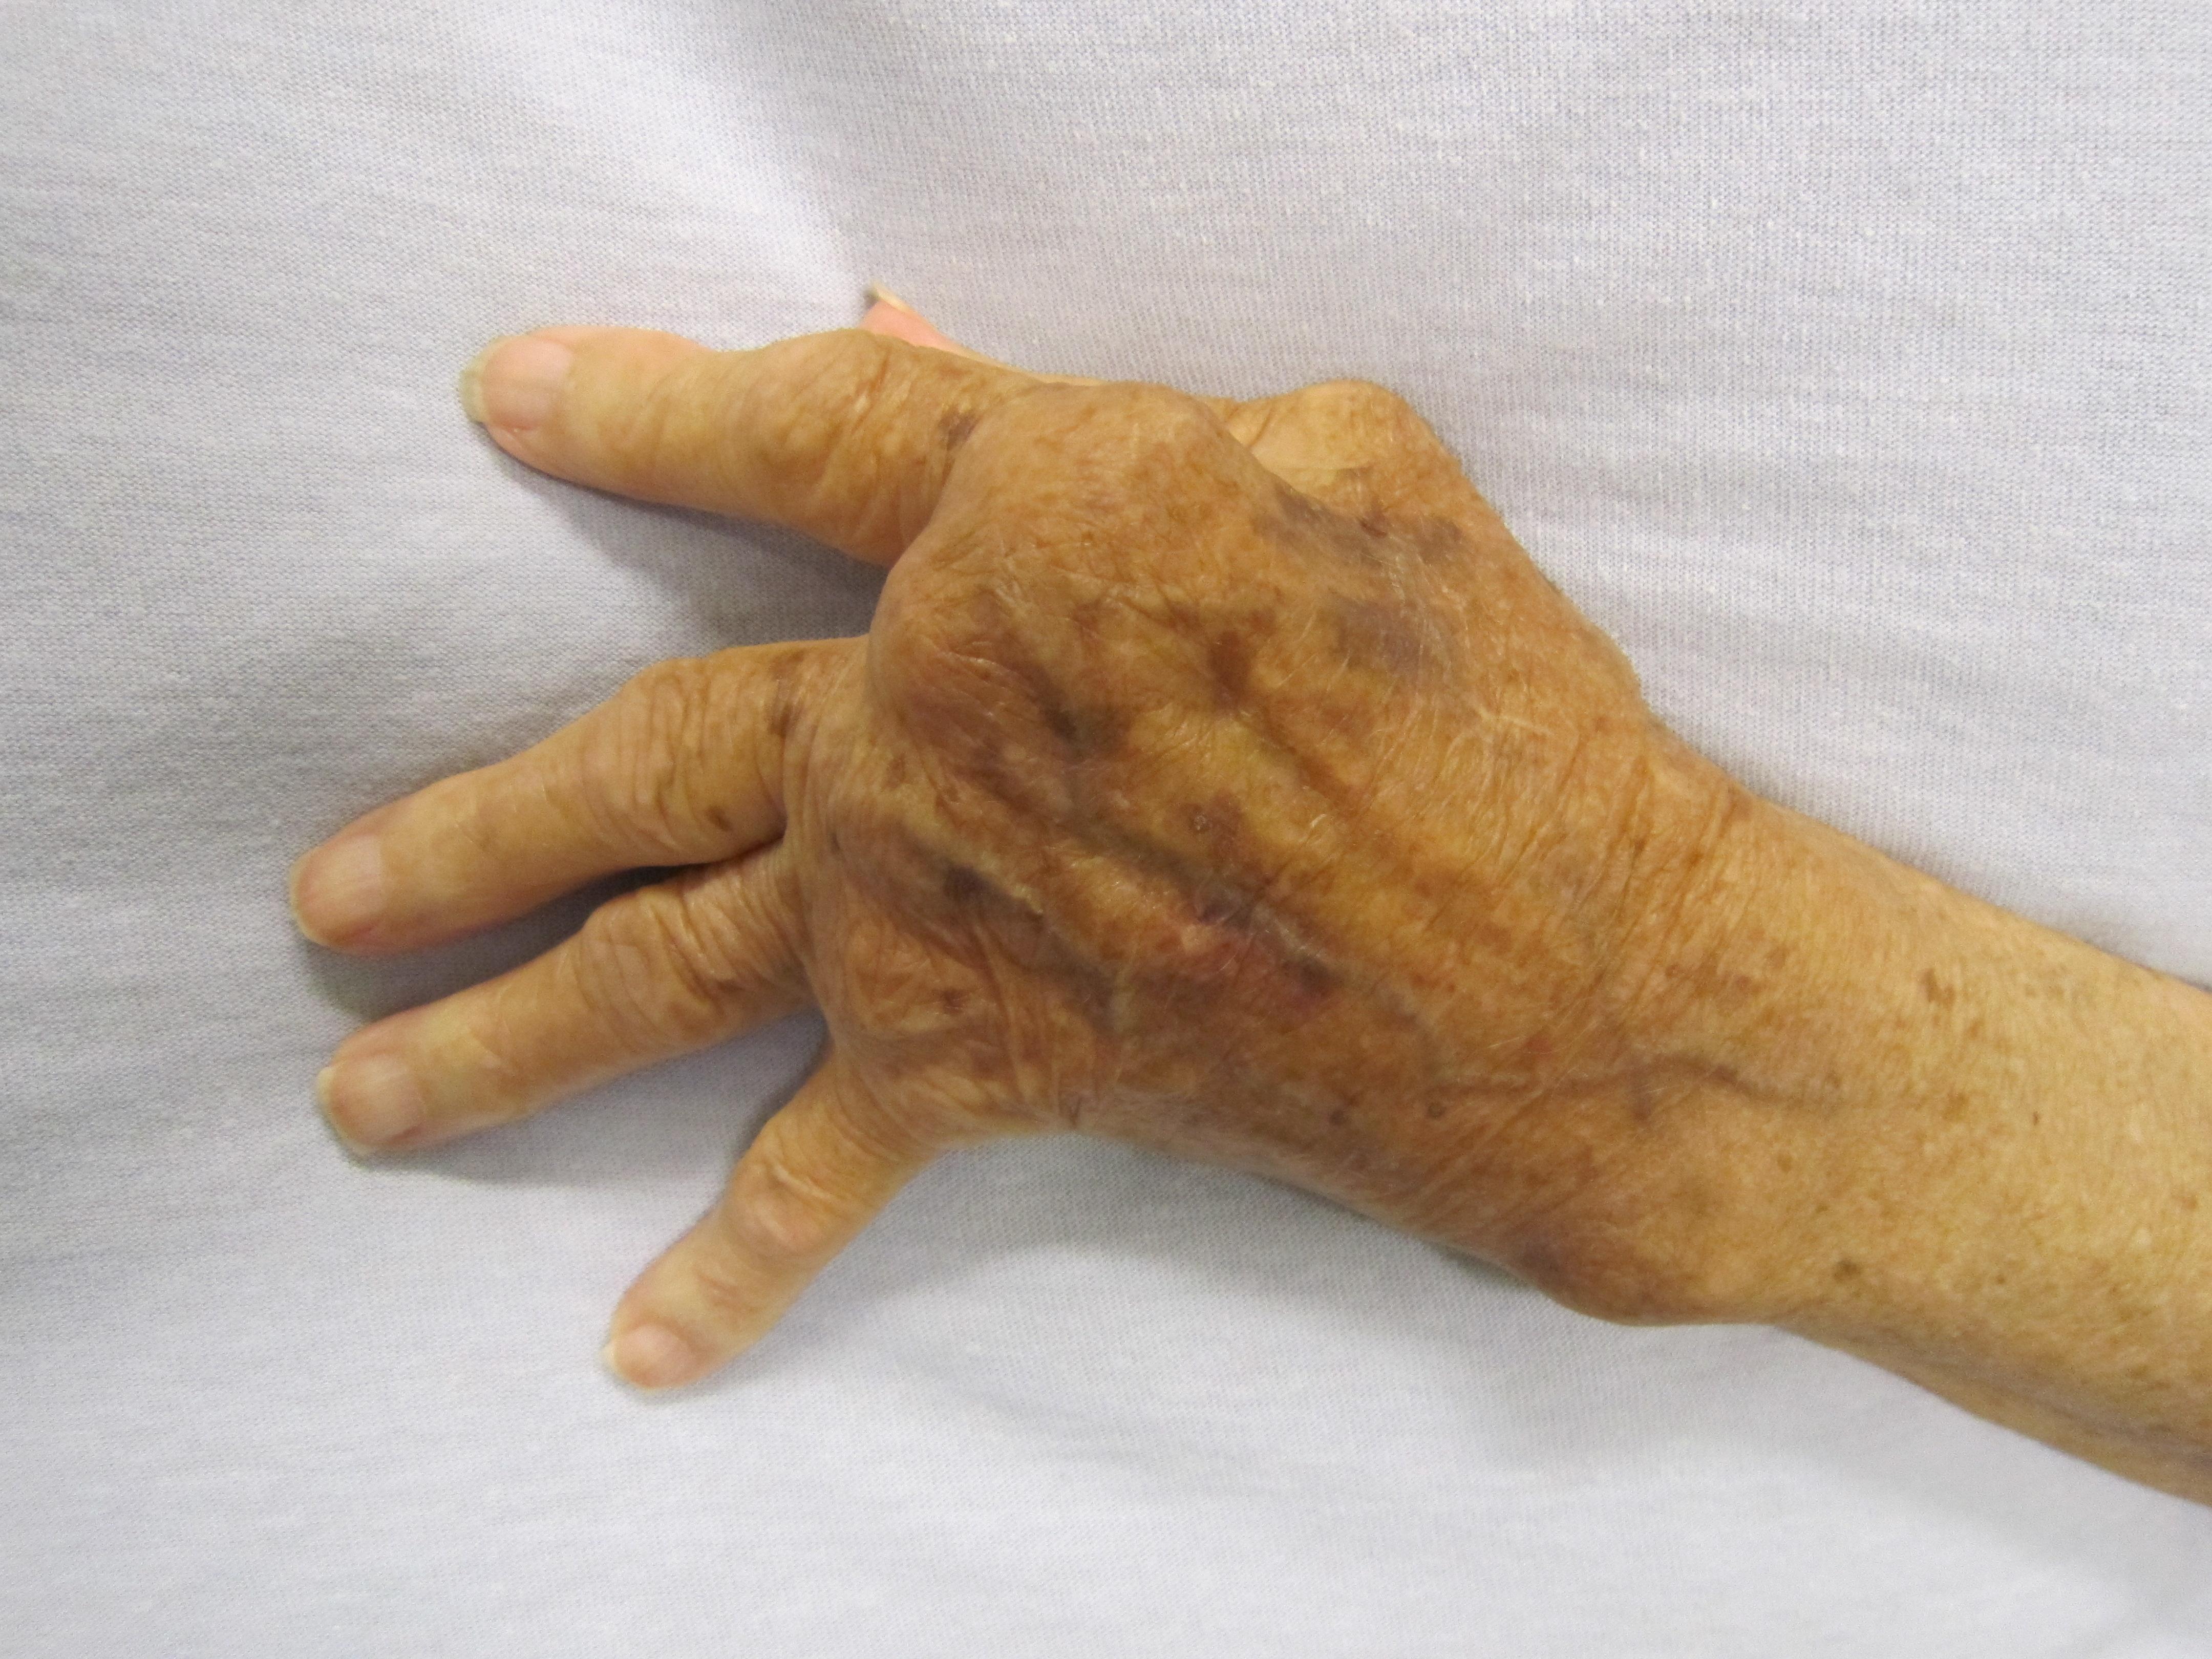 Description rheumatoid arthritis jpg